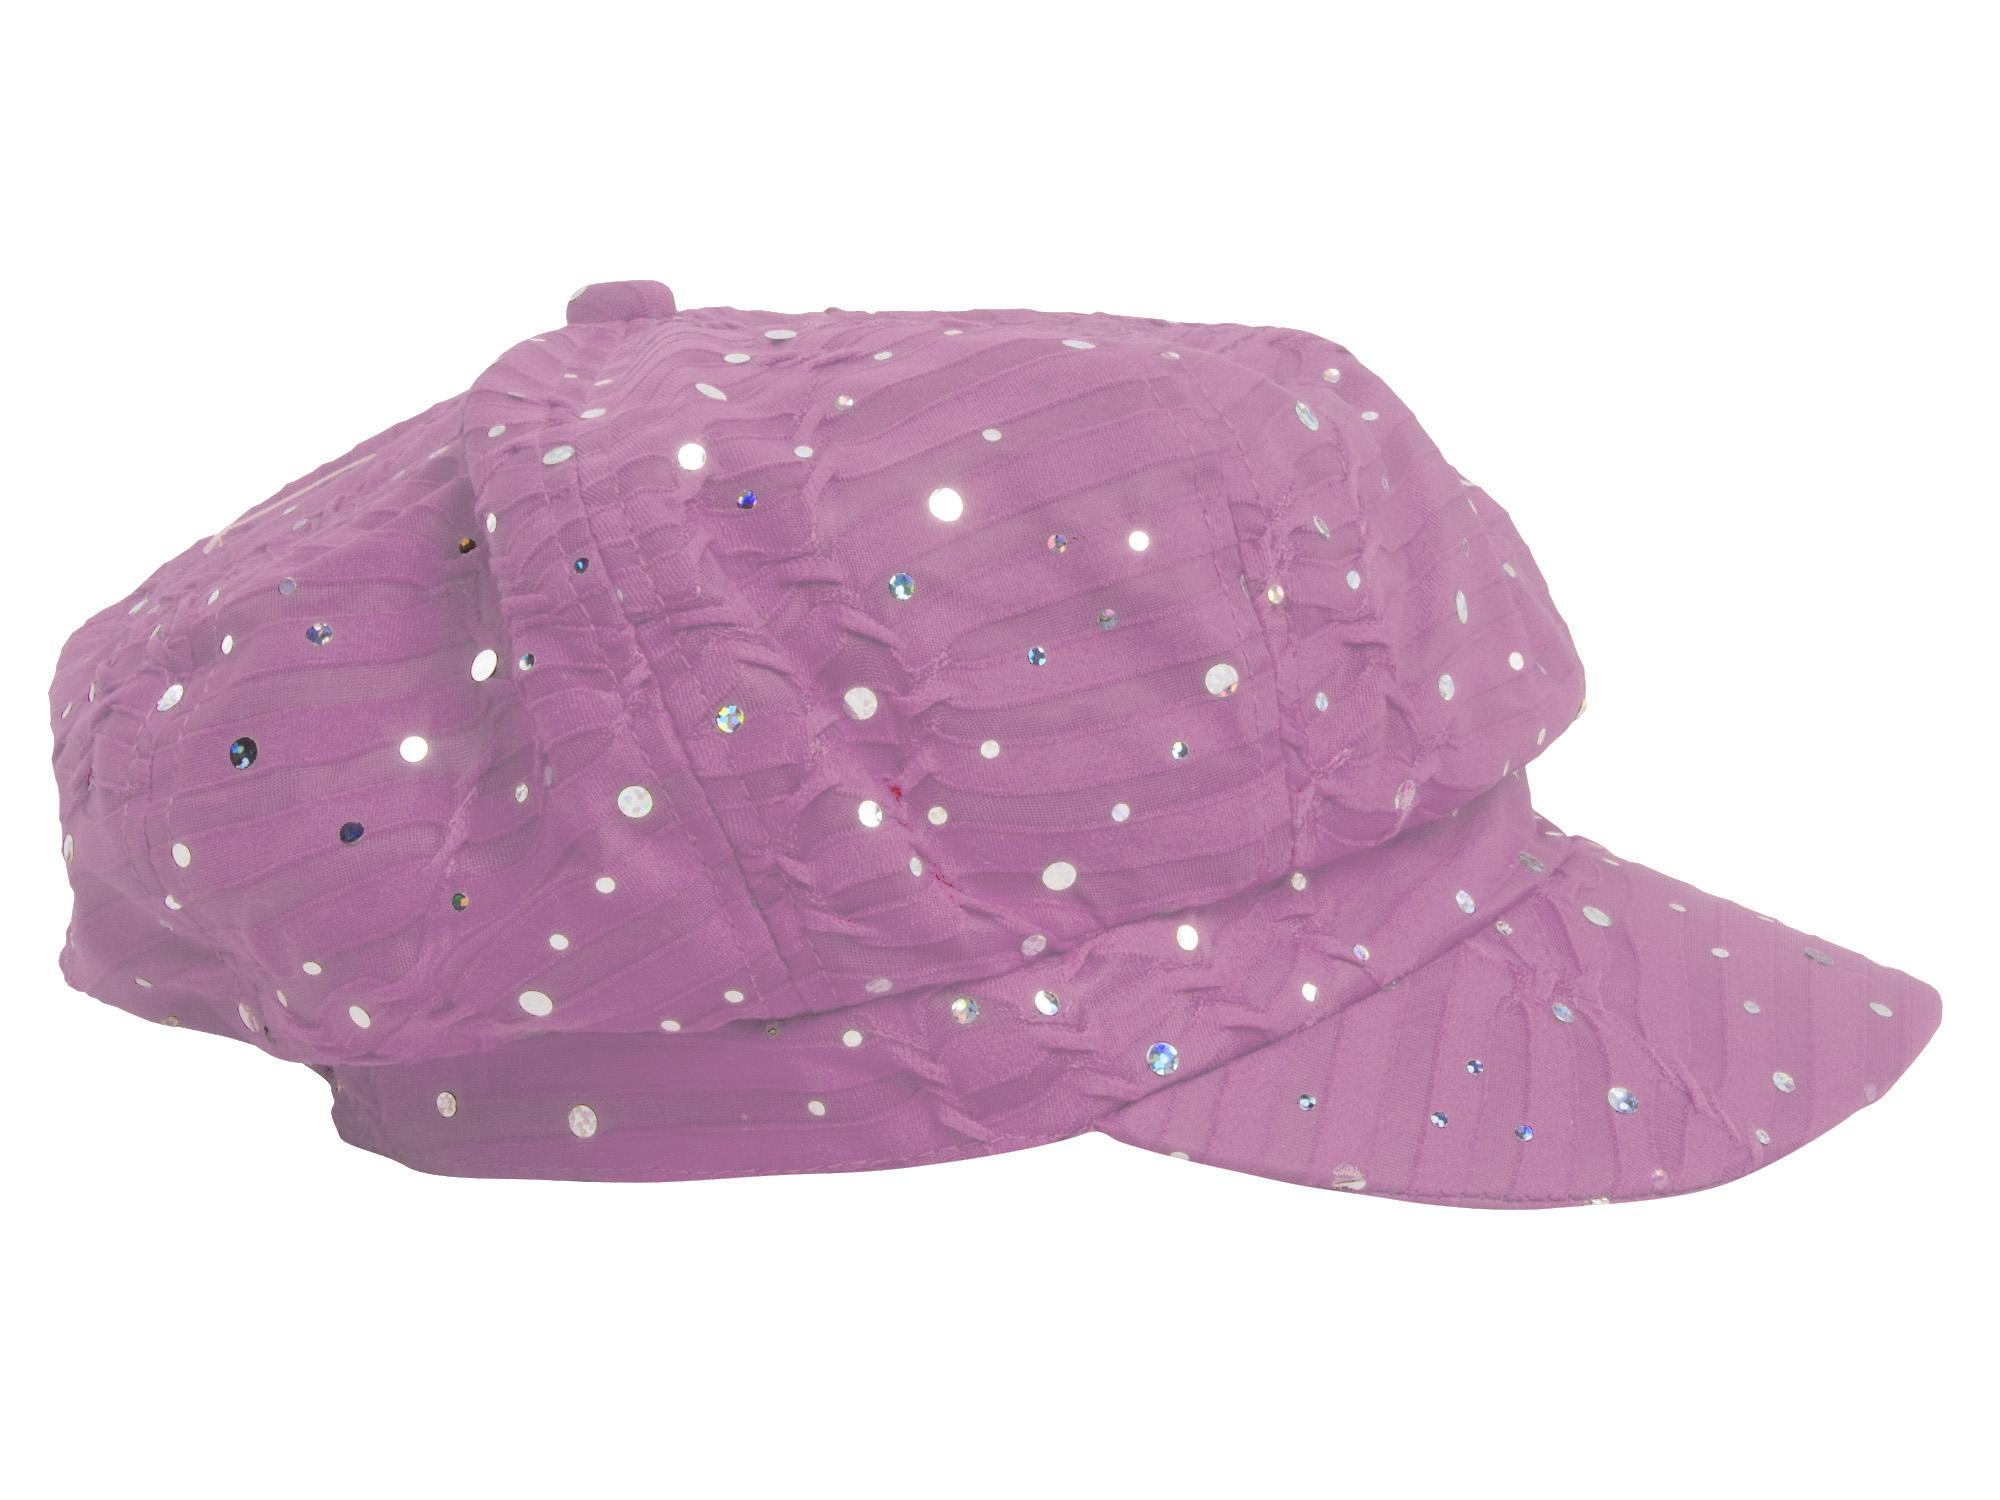 Women-039-s-Glitter-Sequin-Trim-Newsboy-Style-Relaxed-Fit-Hat-Cap thumbnail 19